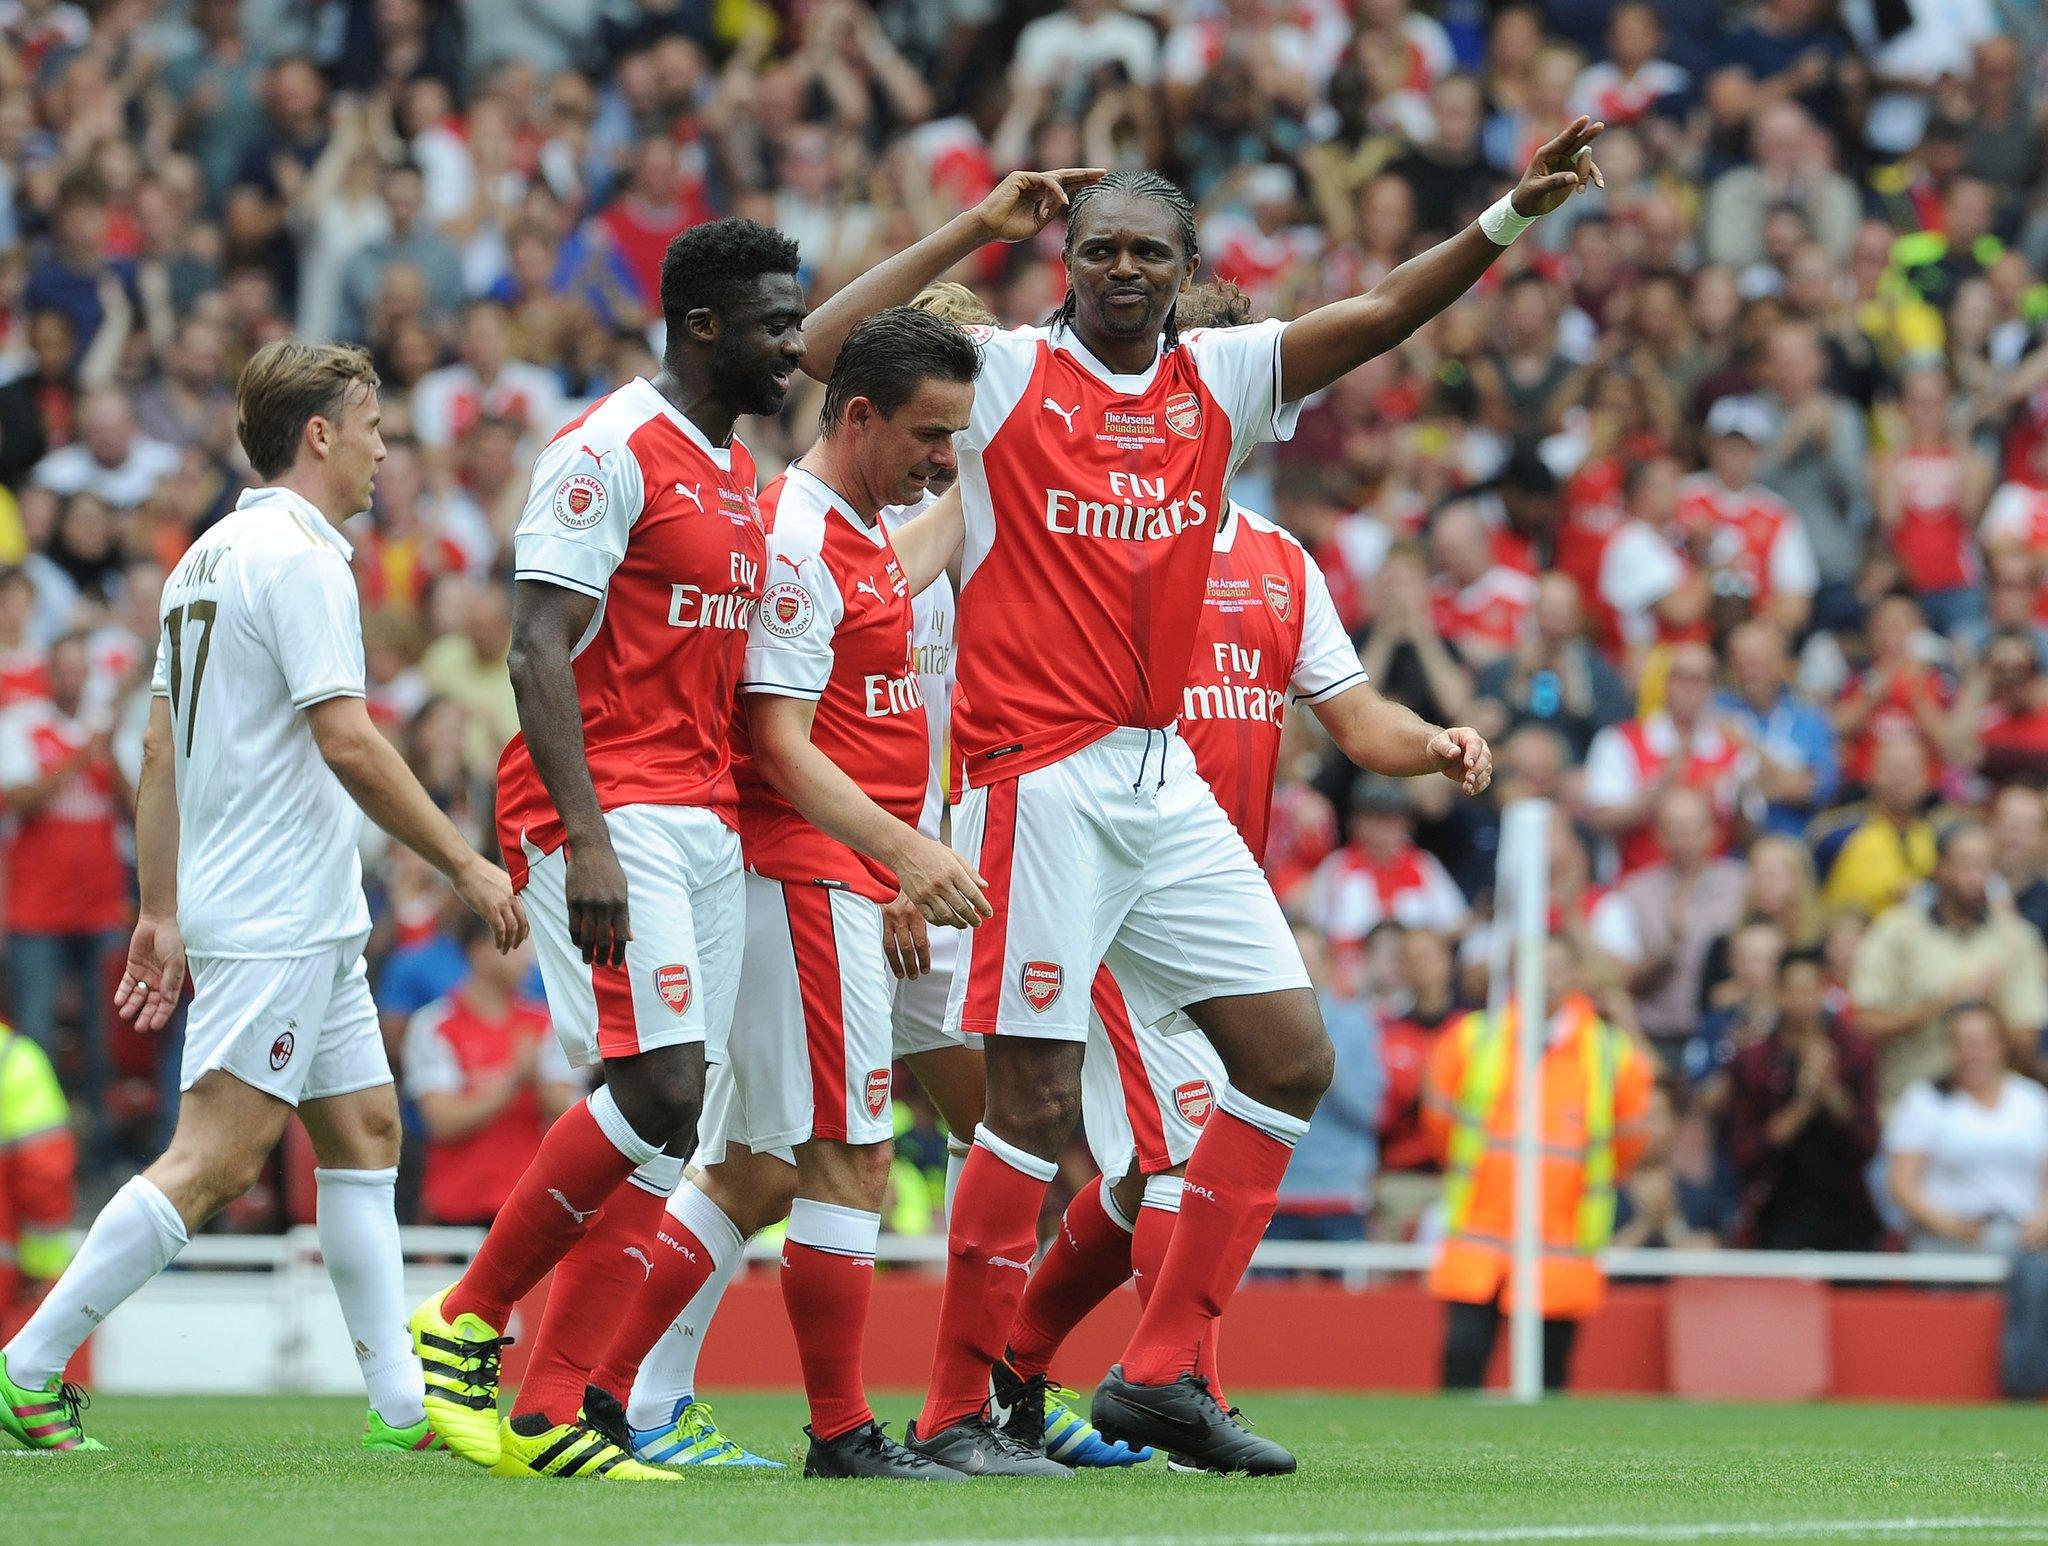 Wenger Praises Kanu, Ikpeba, Toure For Impact On His Career